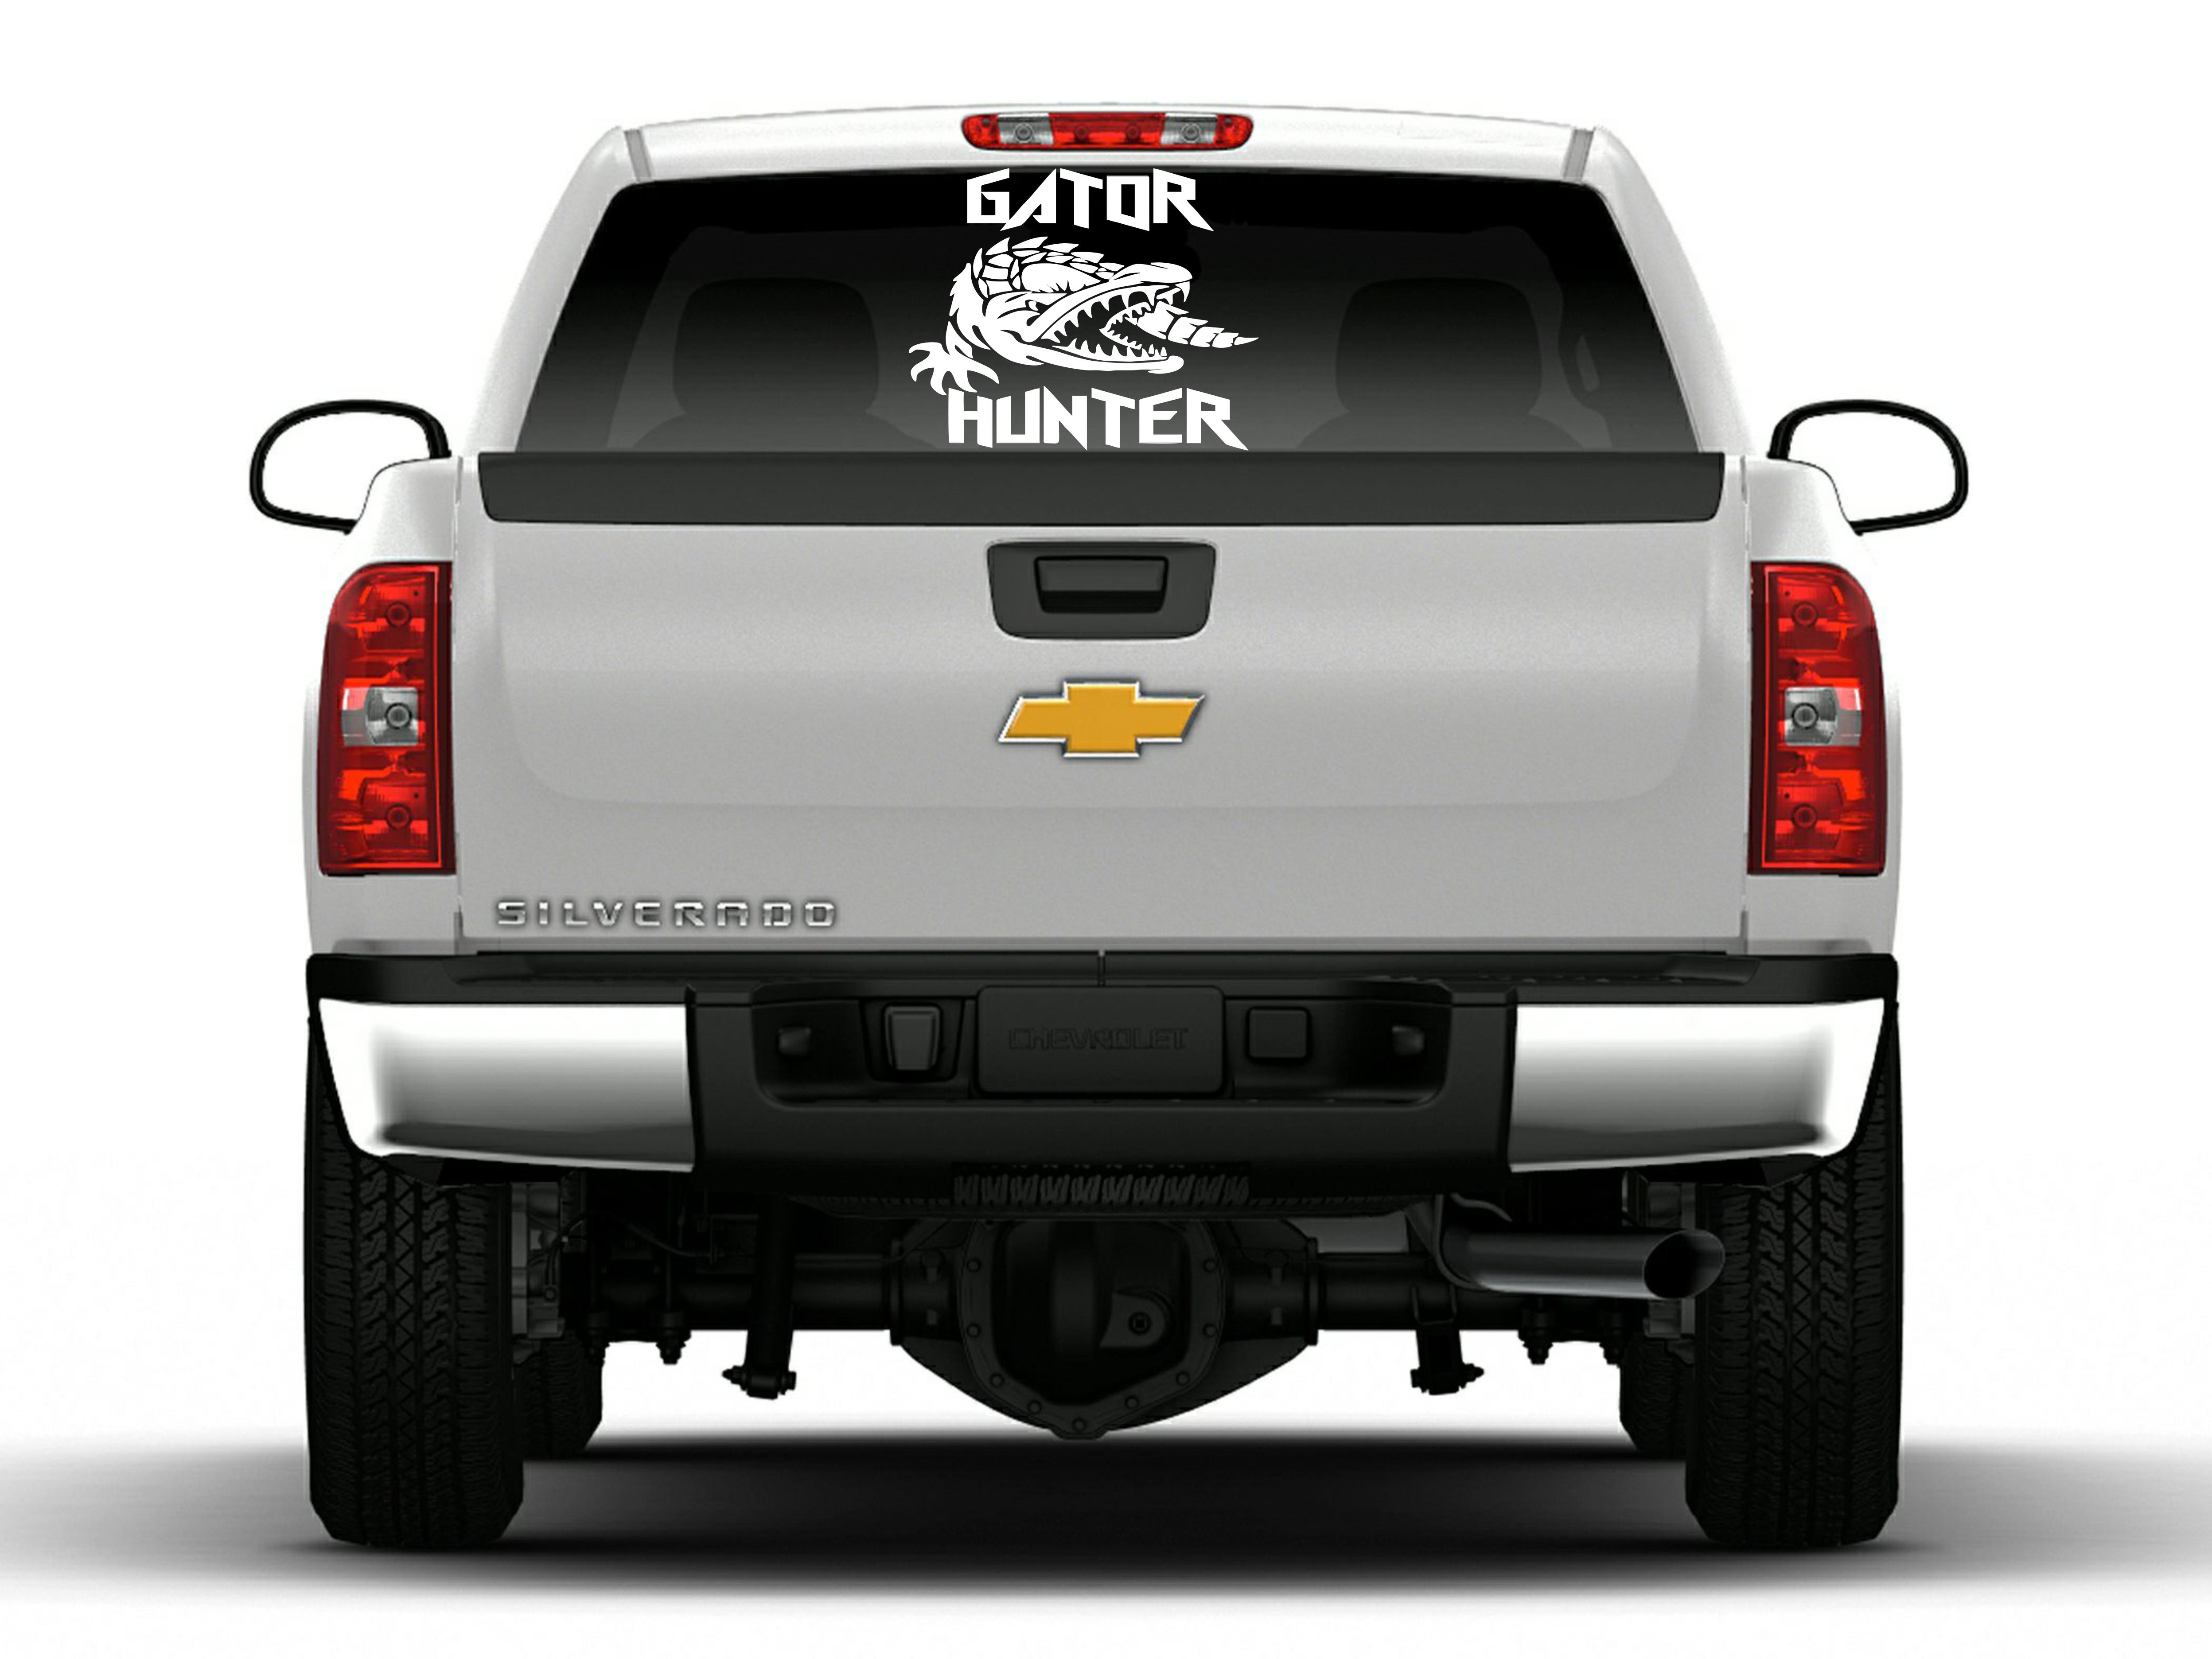 Pin By Sunset Graphics Decals On Car Decal Stickers Pinterest - Chevy rear window decals truckschevy truck window decals